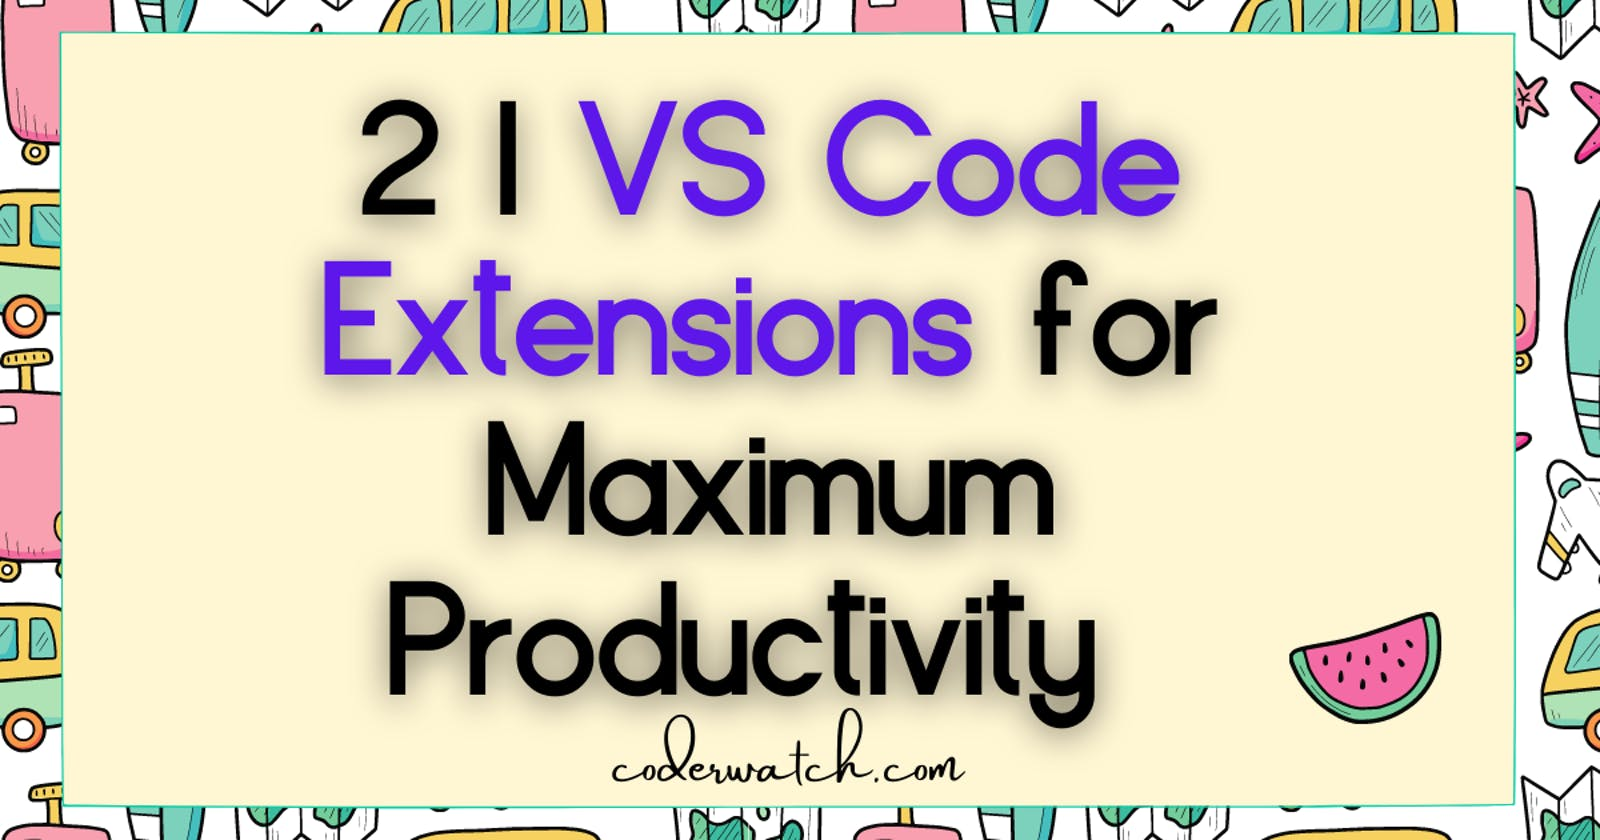 21 Amazing VS Code extensions for maximum productivity 2021